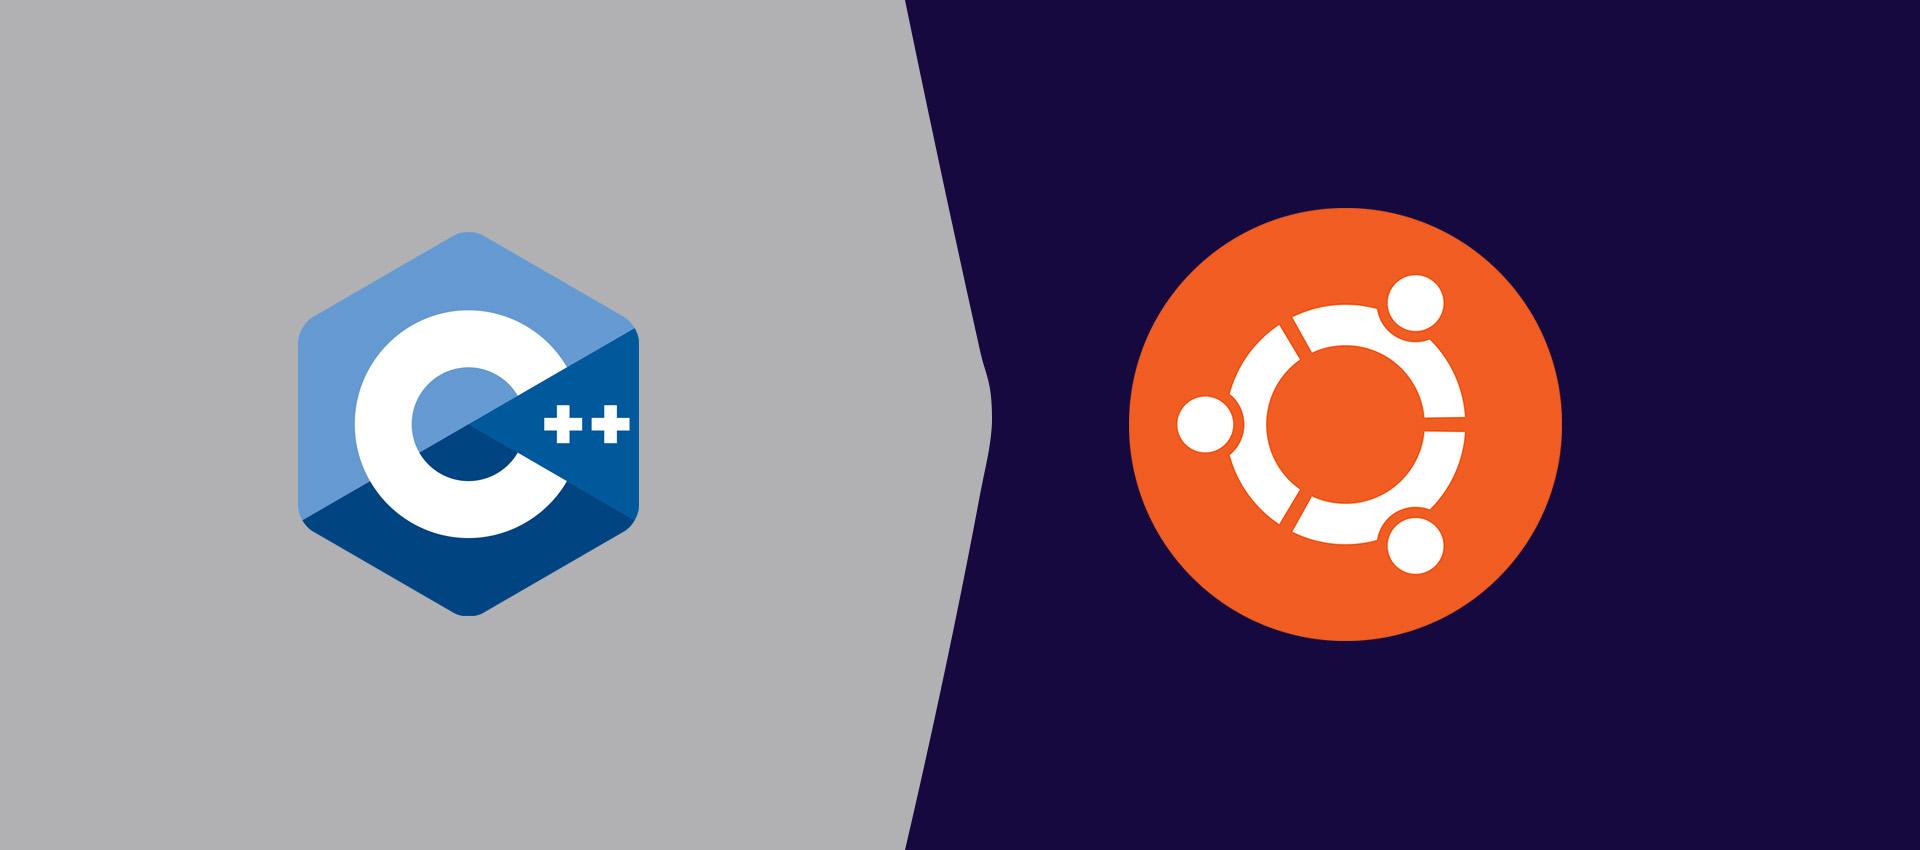 How To Install GCC On Ubuntu 18.04 LTS